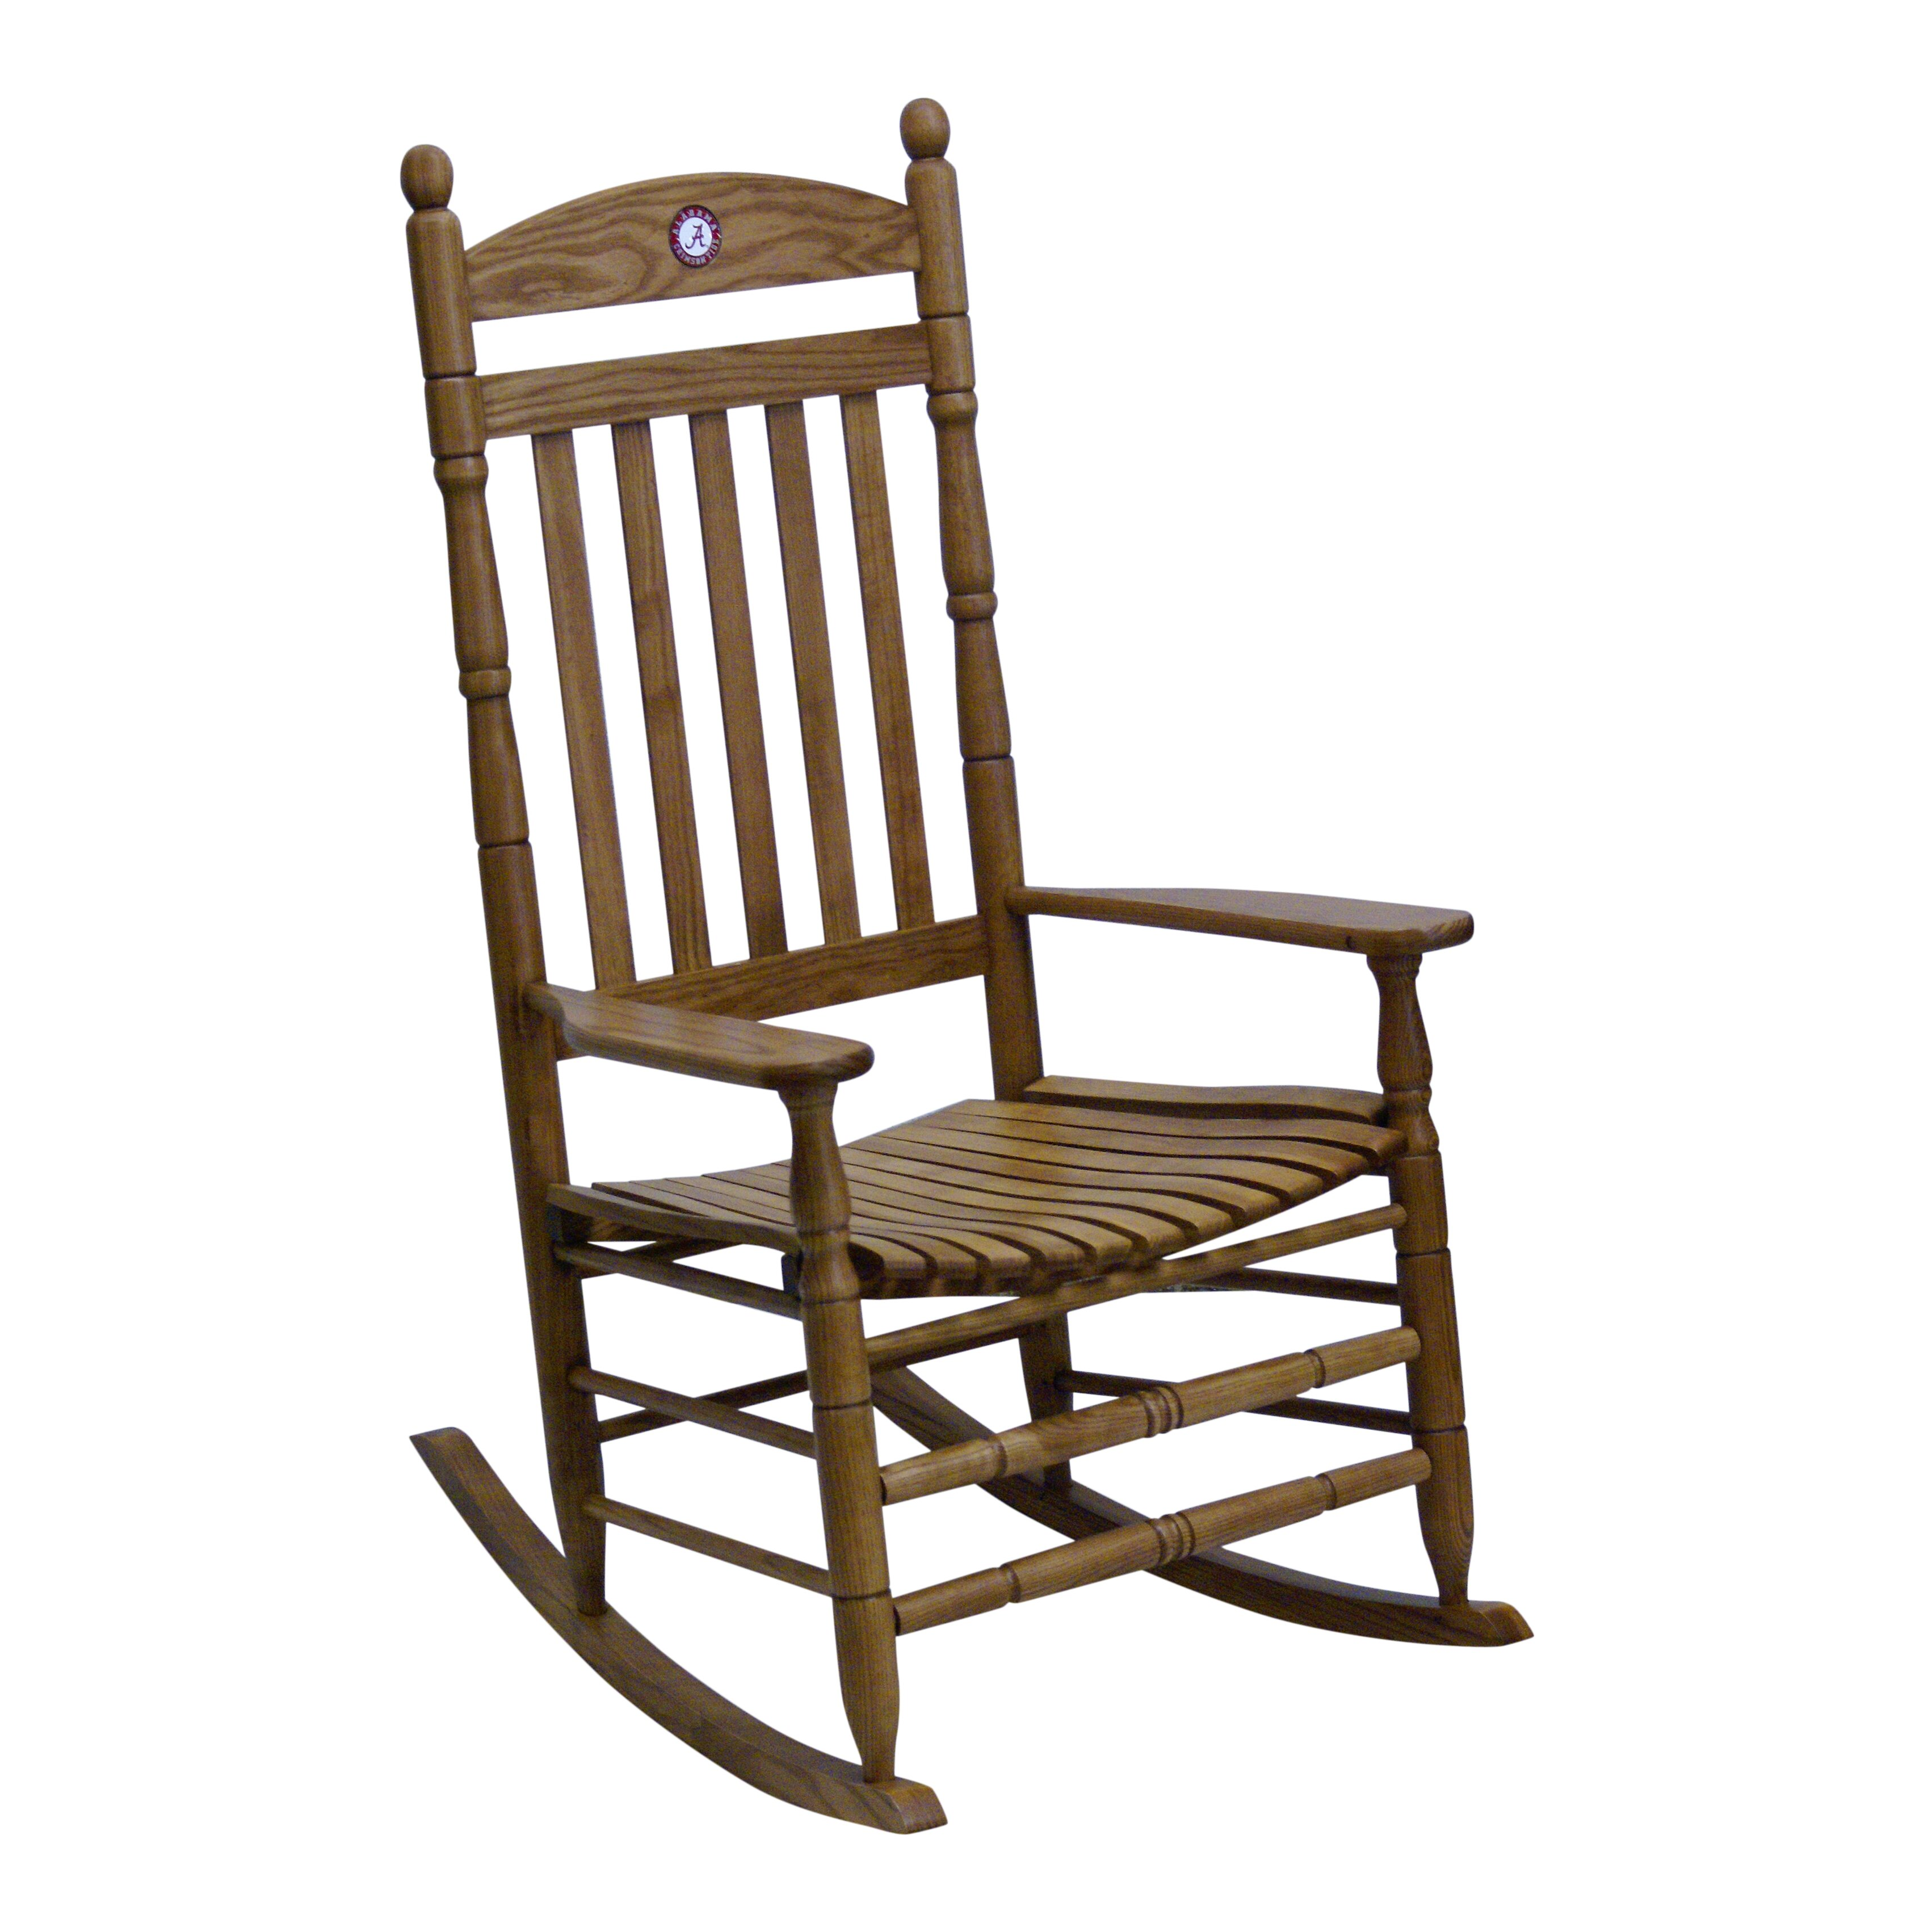 Furniture ... Wood Patio Rocking Chairs & Gliders Hinkle Chair Company ...